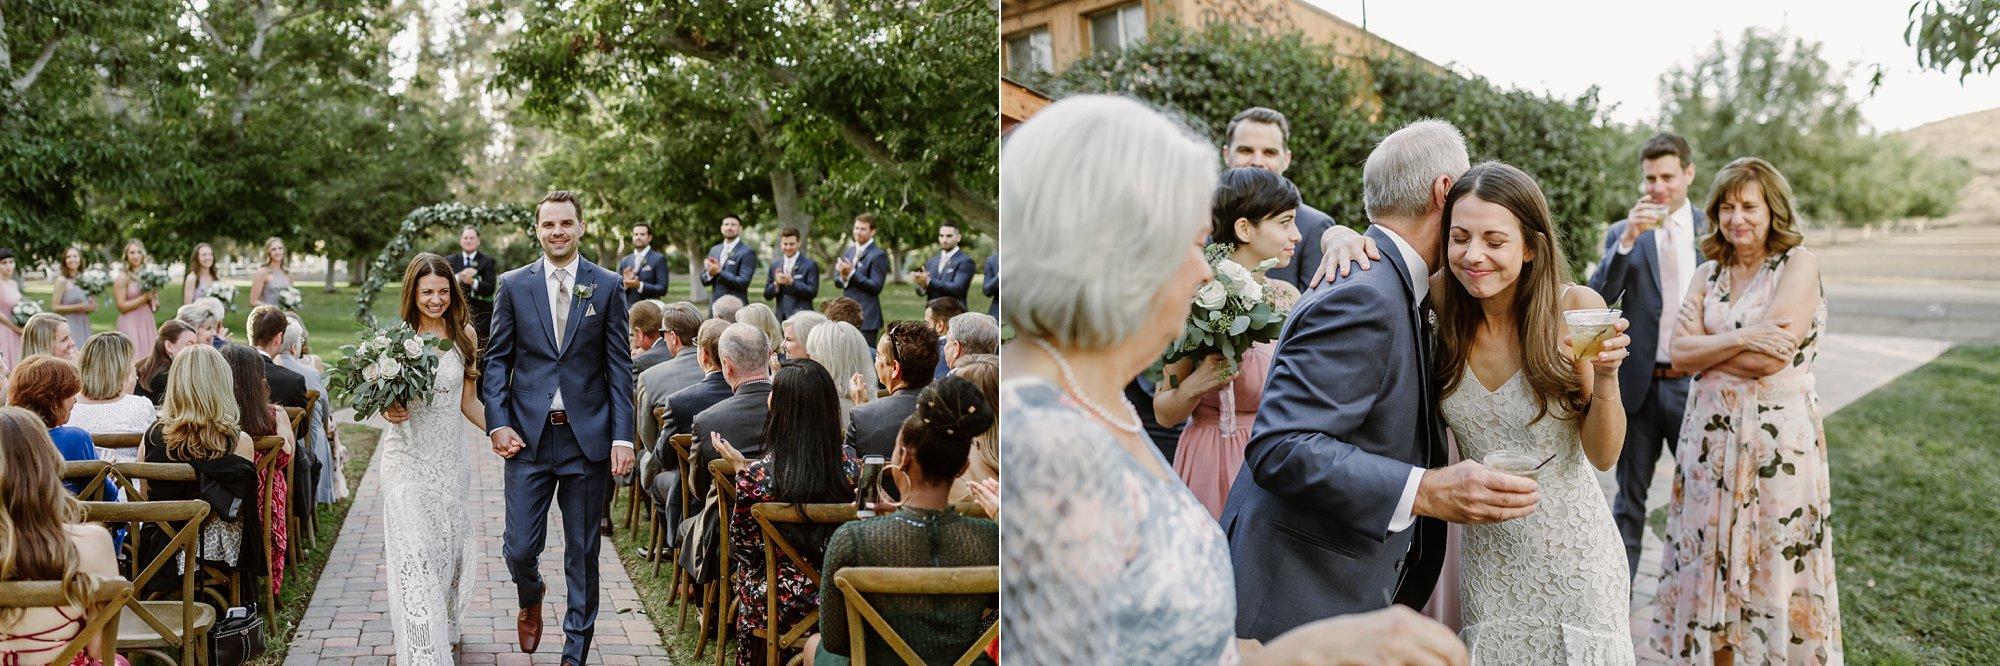 Walnut Grove Moorpark California Wedding_0046.jpg